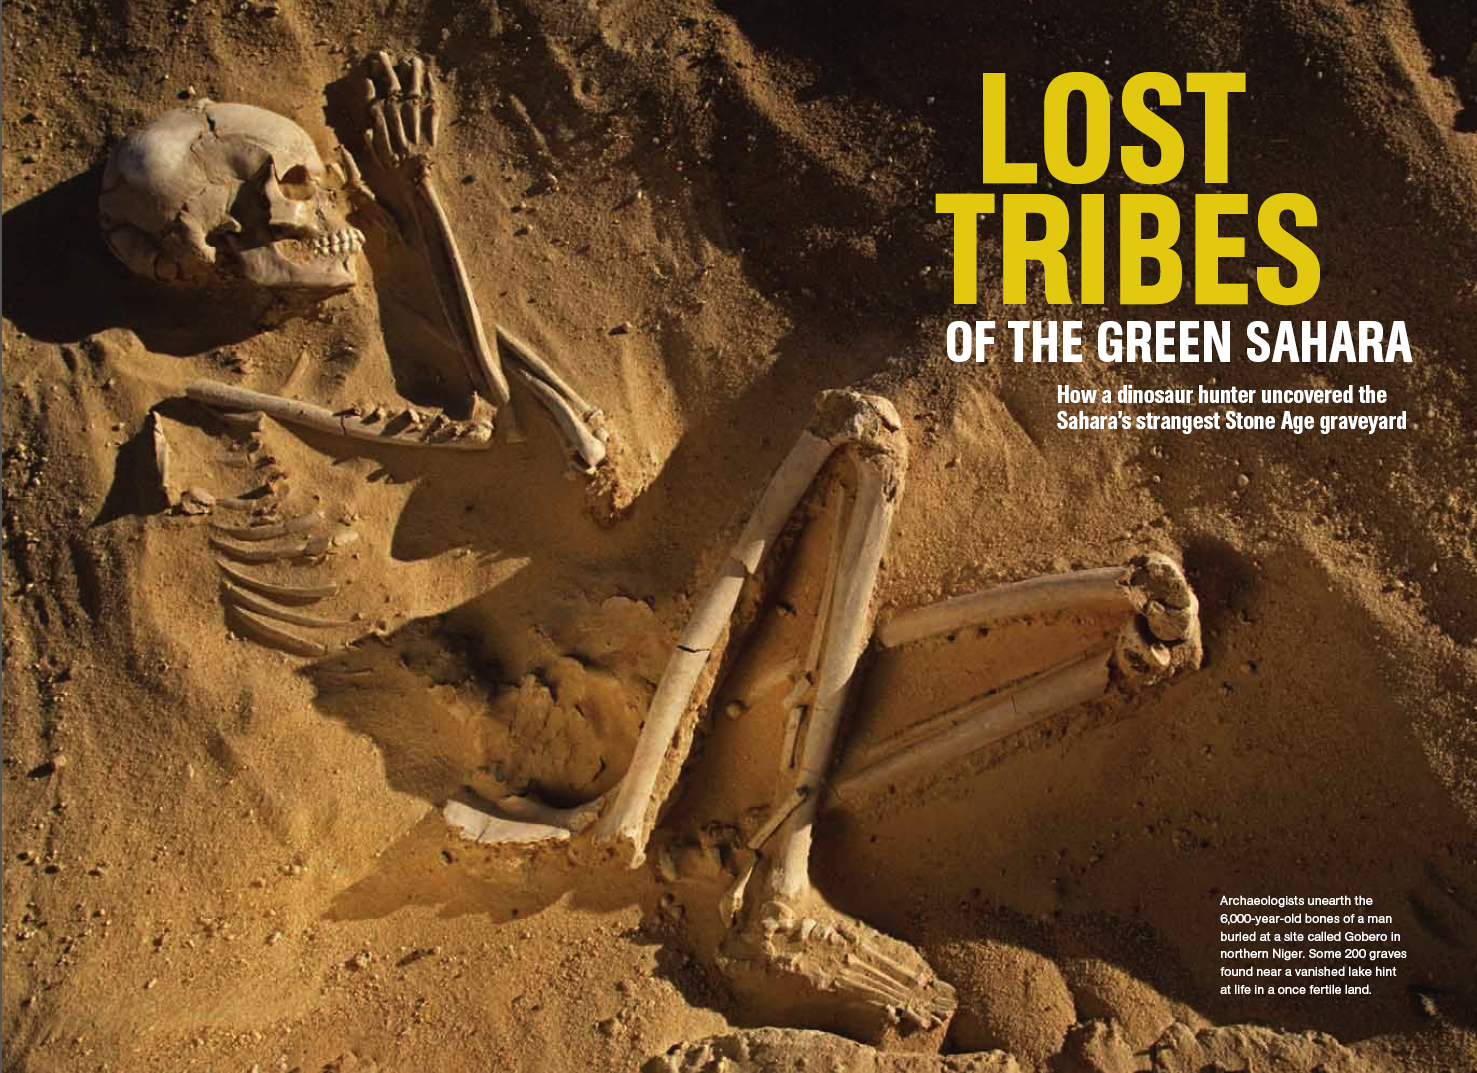 Green Sahara Archeology Story (Link)